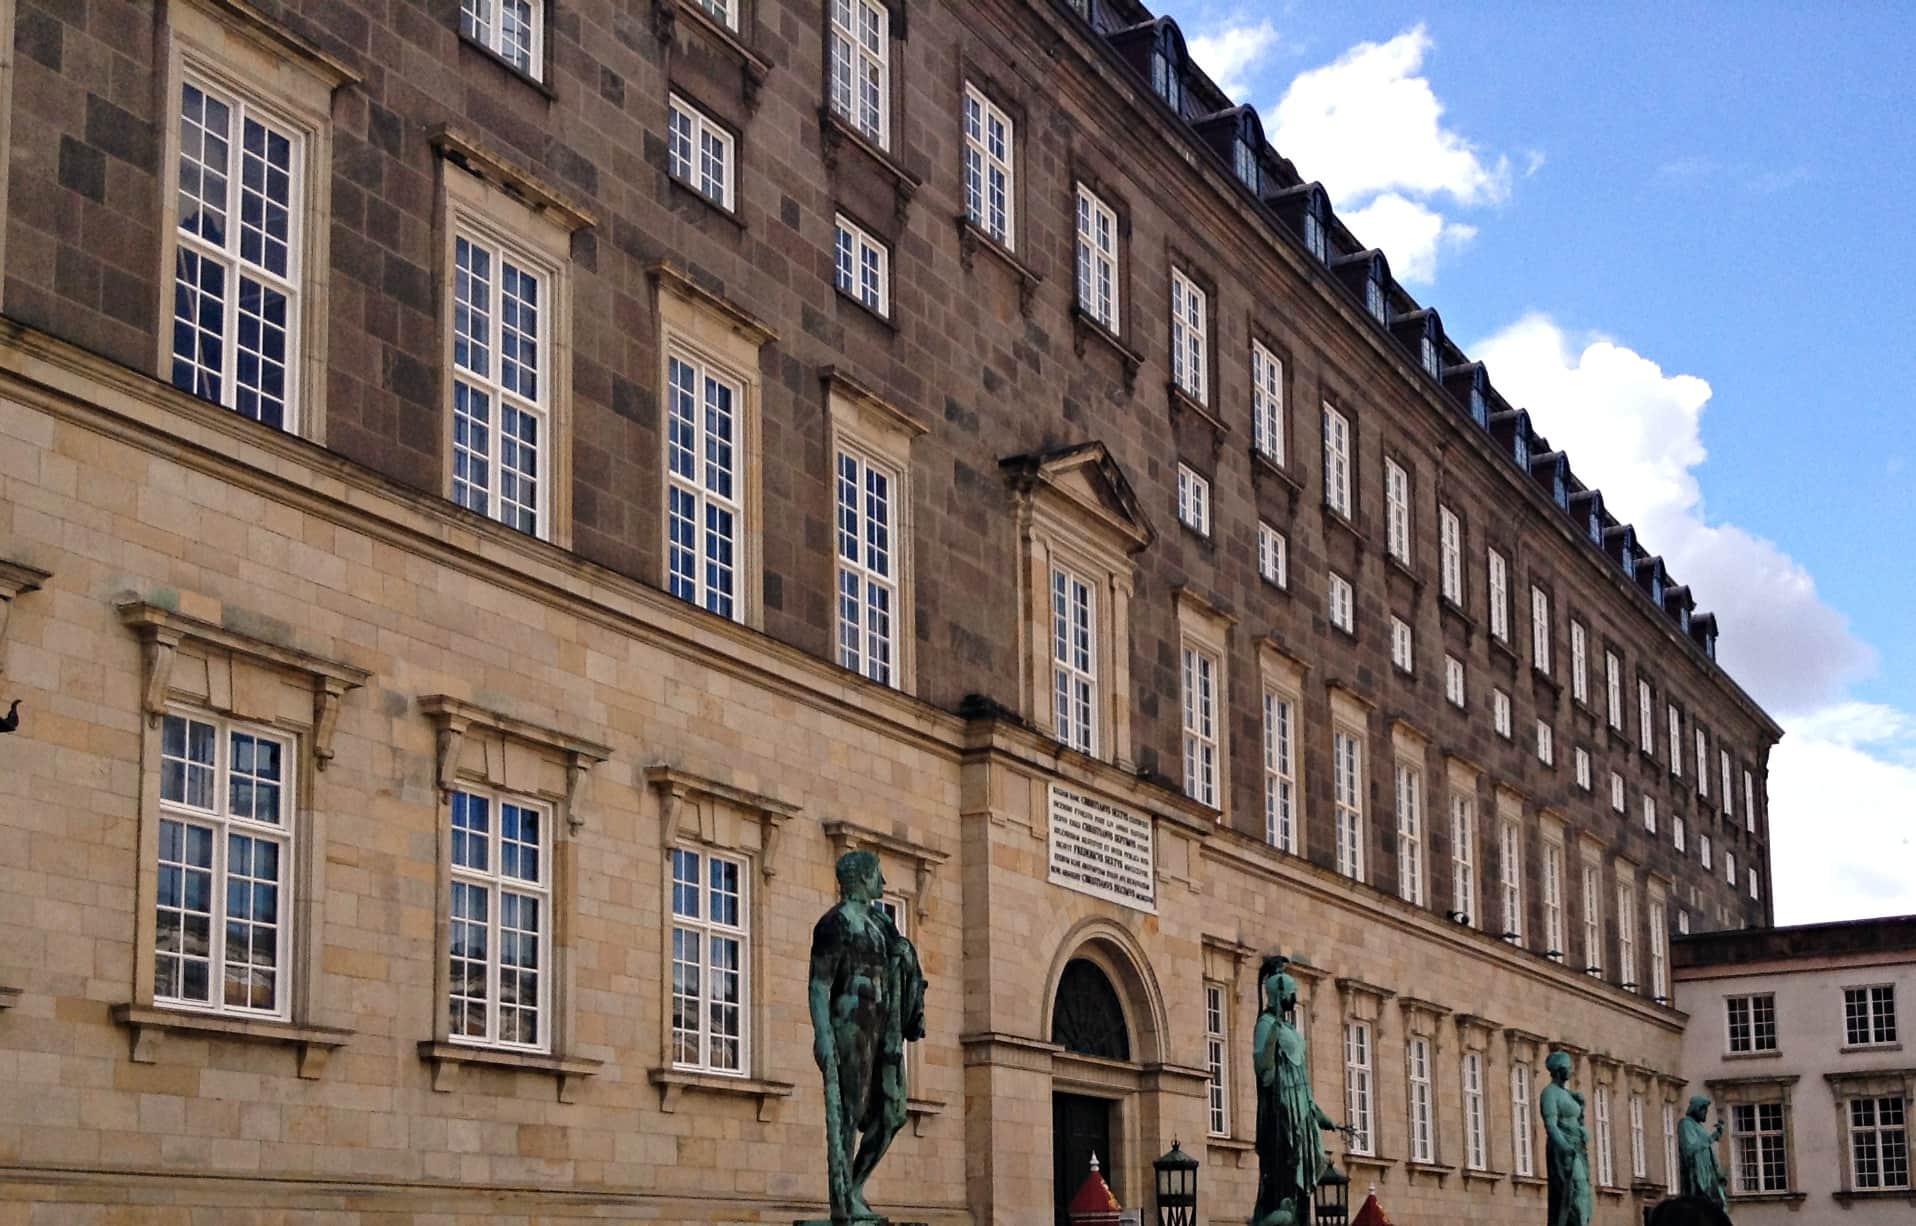 Copenhagen Christiansborg Palace